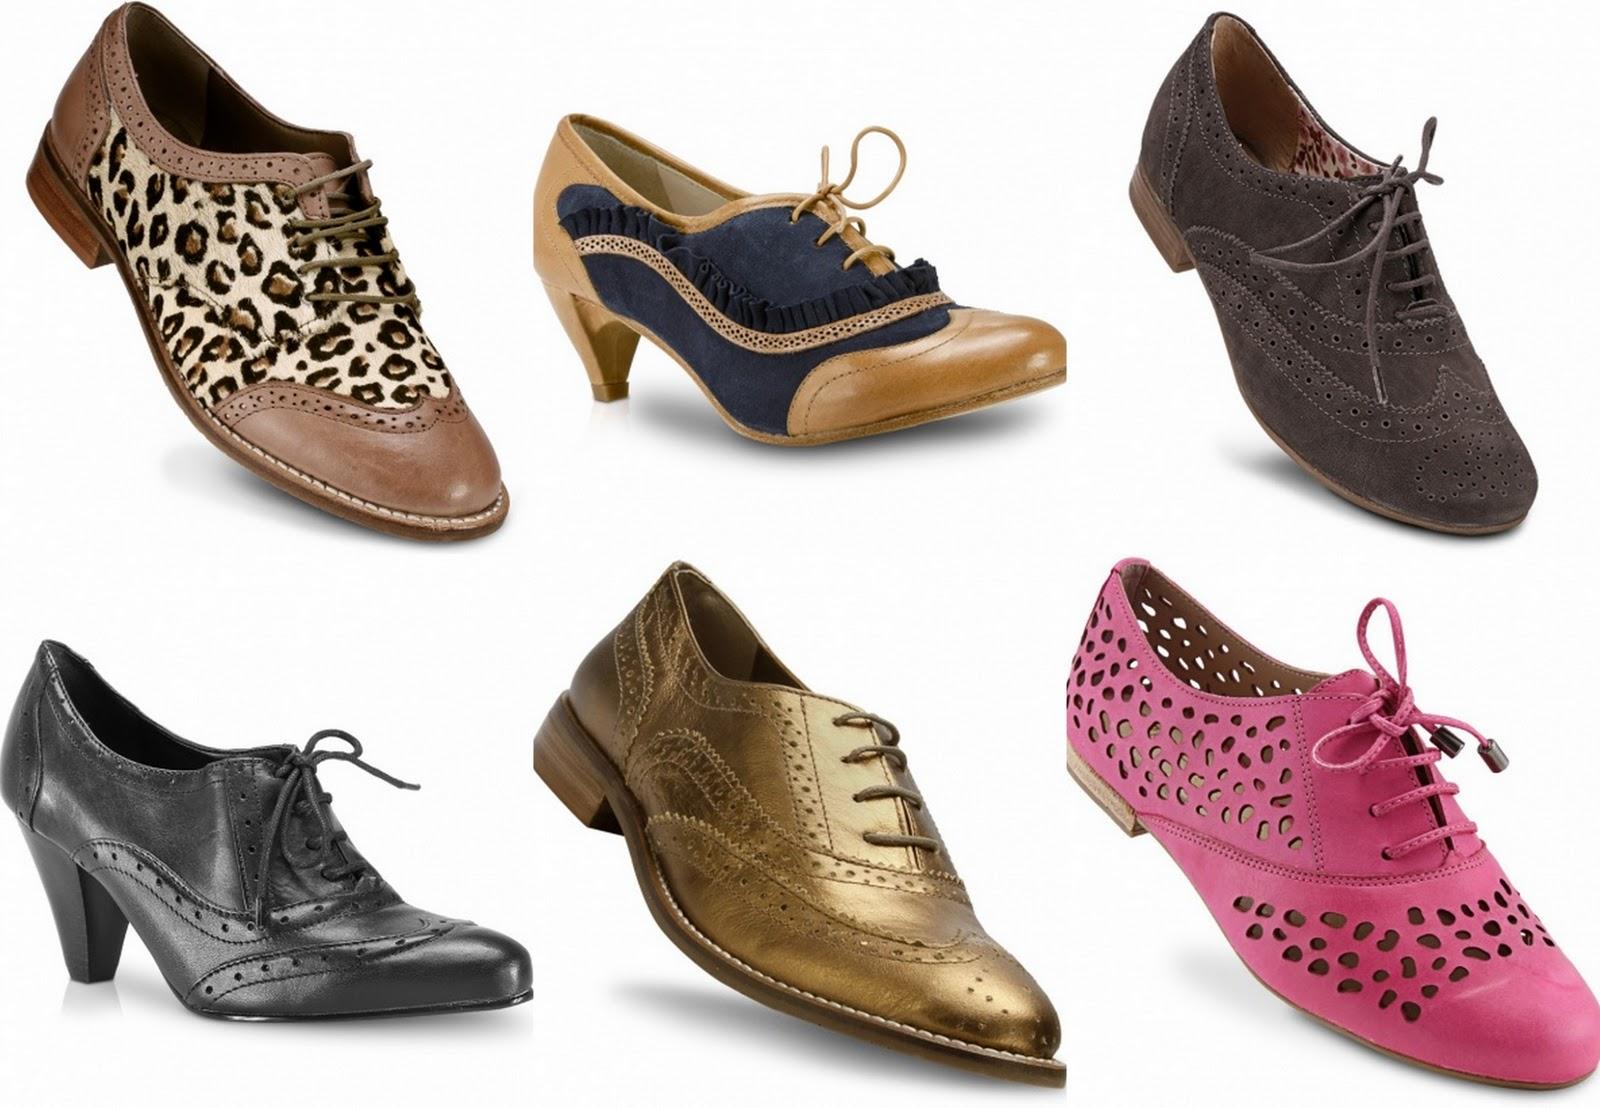 9ce2e0612 Sapatos femininos | Sapatos Femininos - Últimos modelos das famosas!